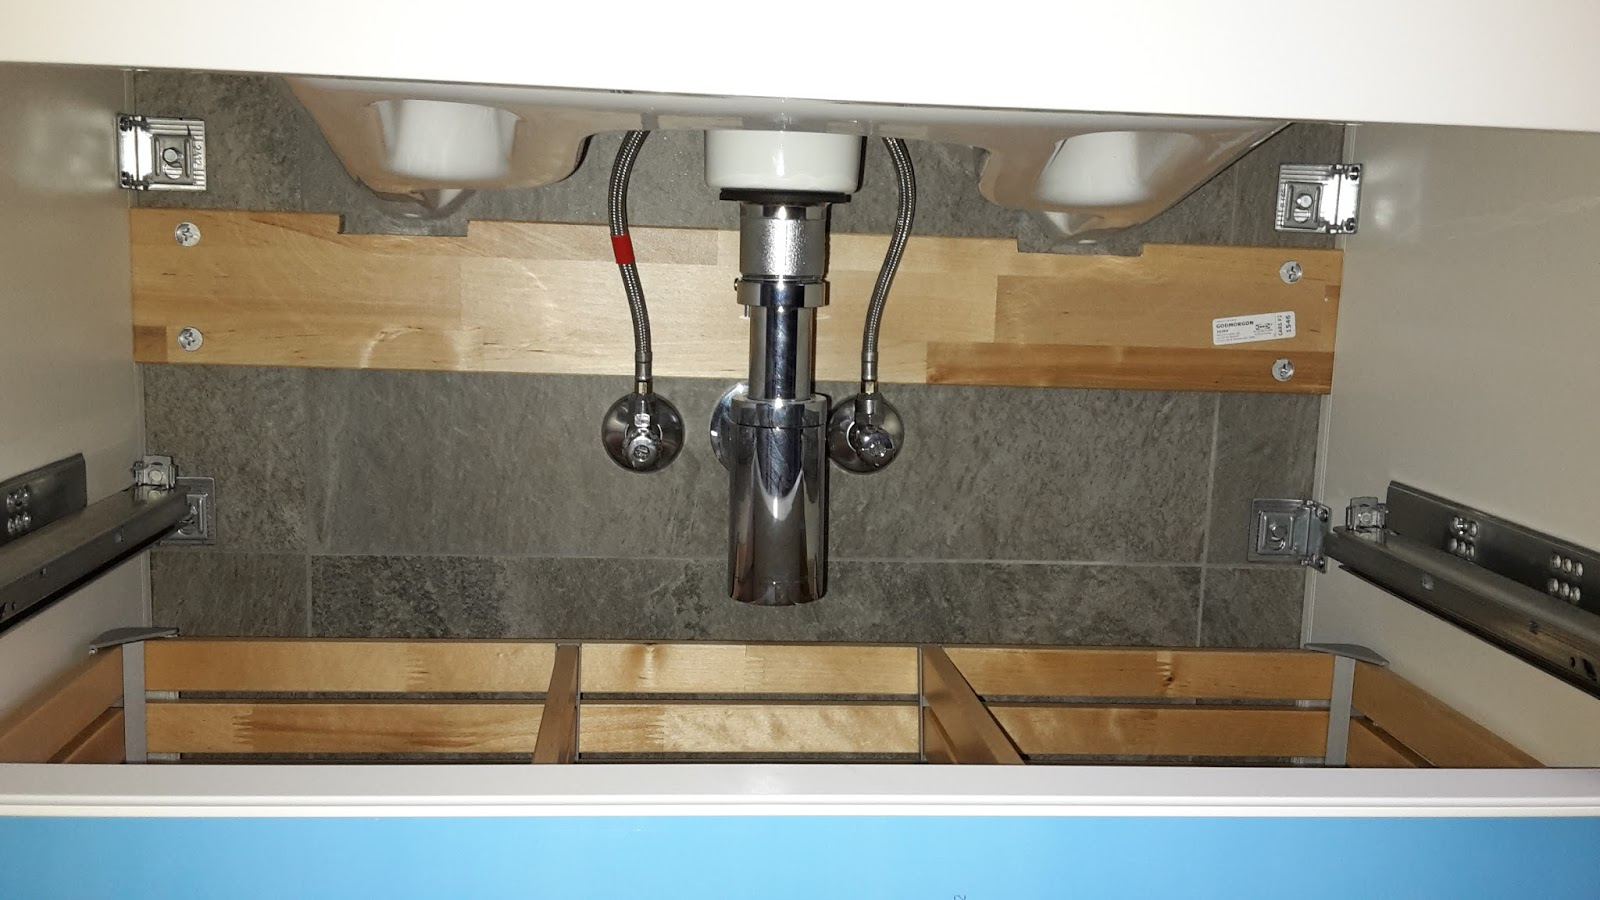 ikea kuche schublade passt nicht. Black Bedroom Furniture Sets. Home Design Ideas